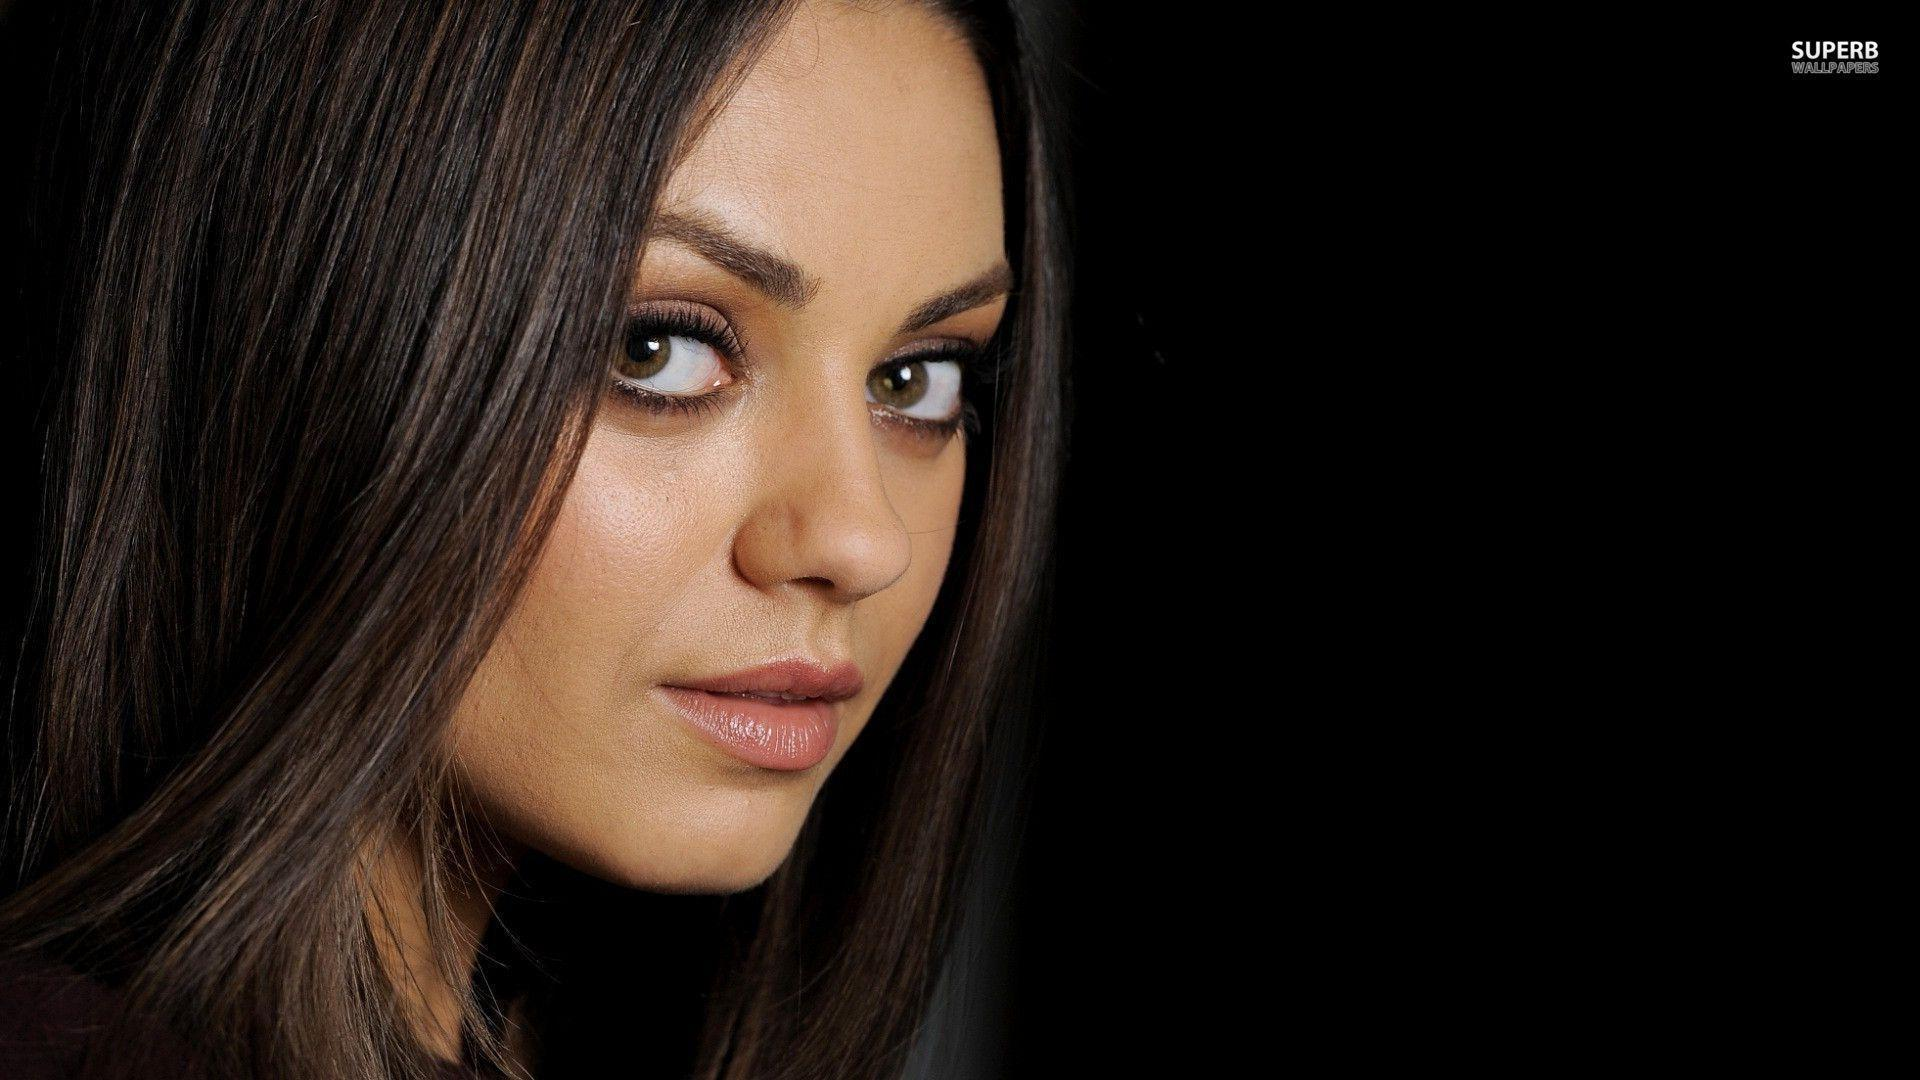 Mila Kunis wallpaper - Celebrity wallpapers - #